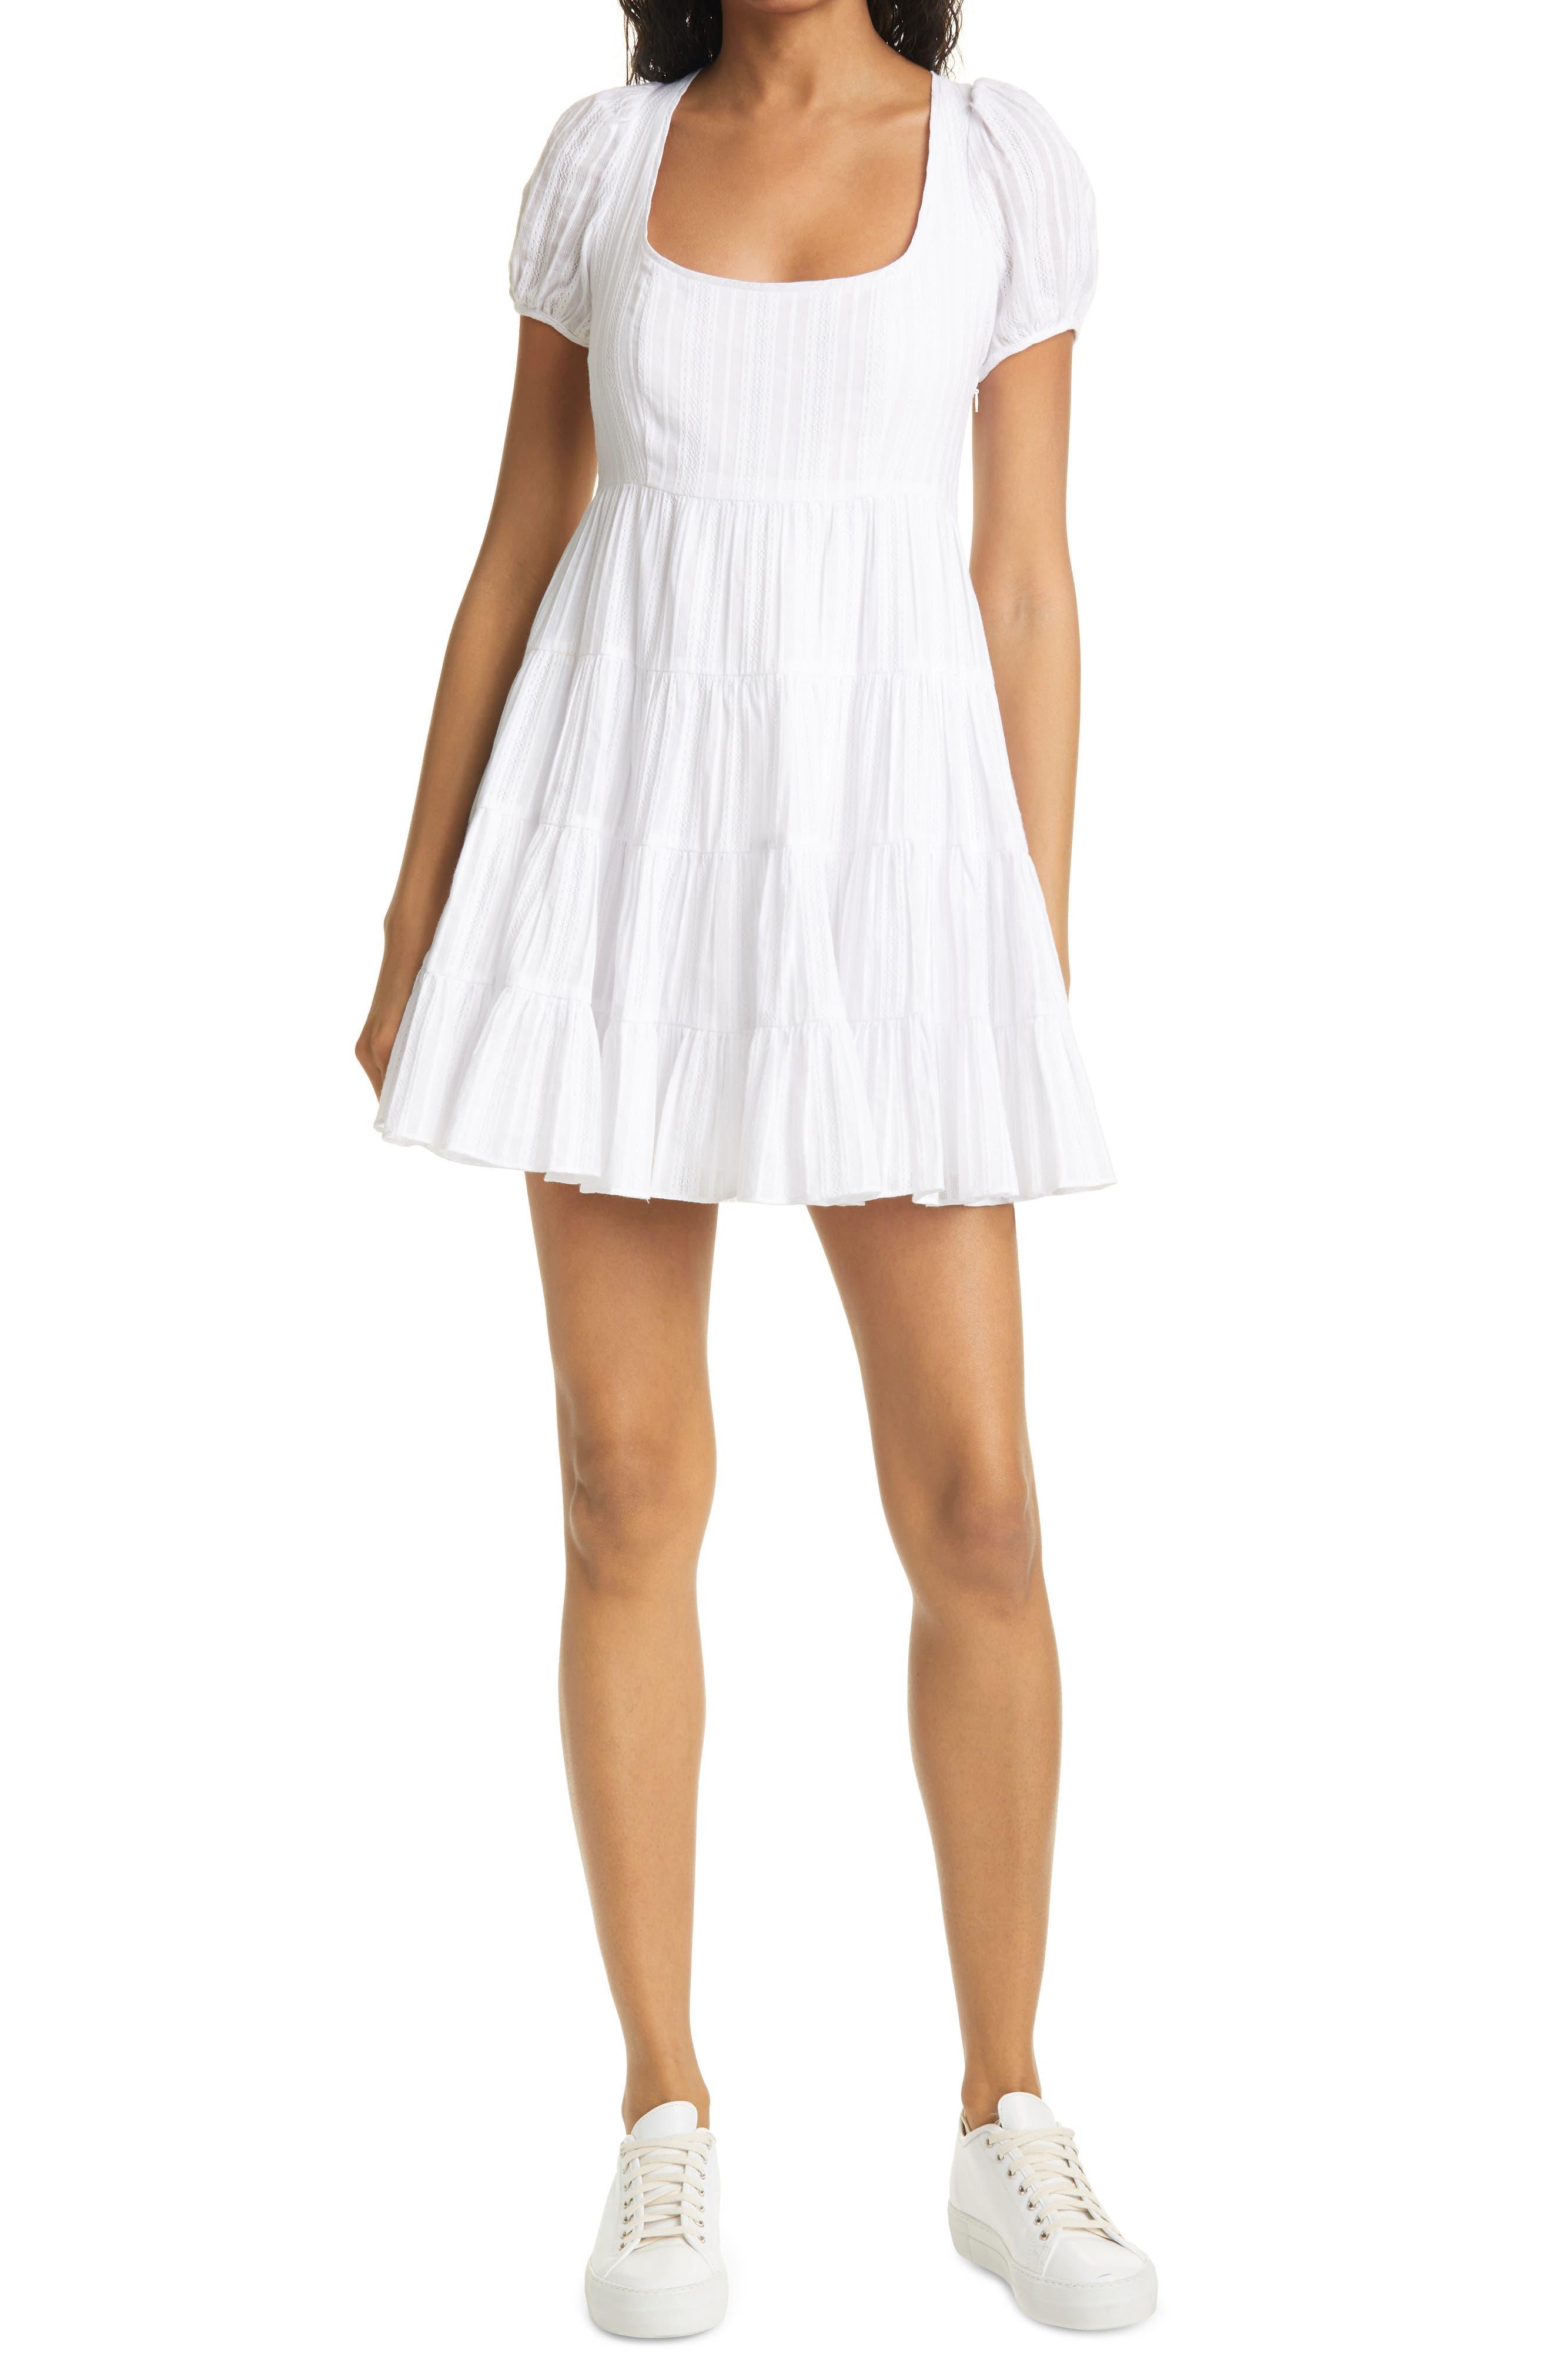 Chloe Puff Sleeve Textured Tiered Minidress